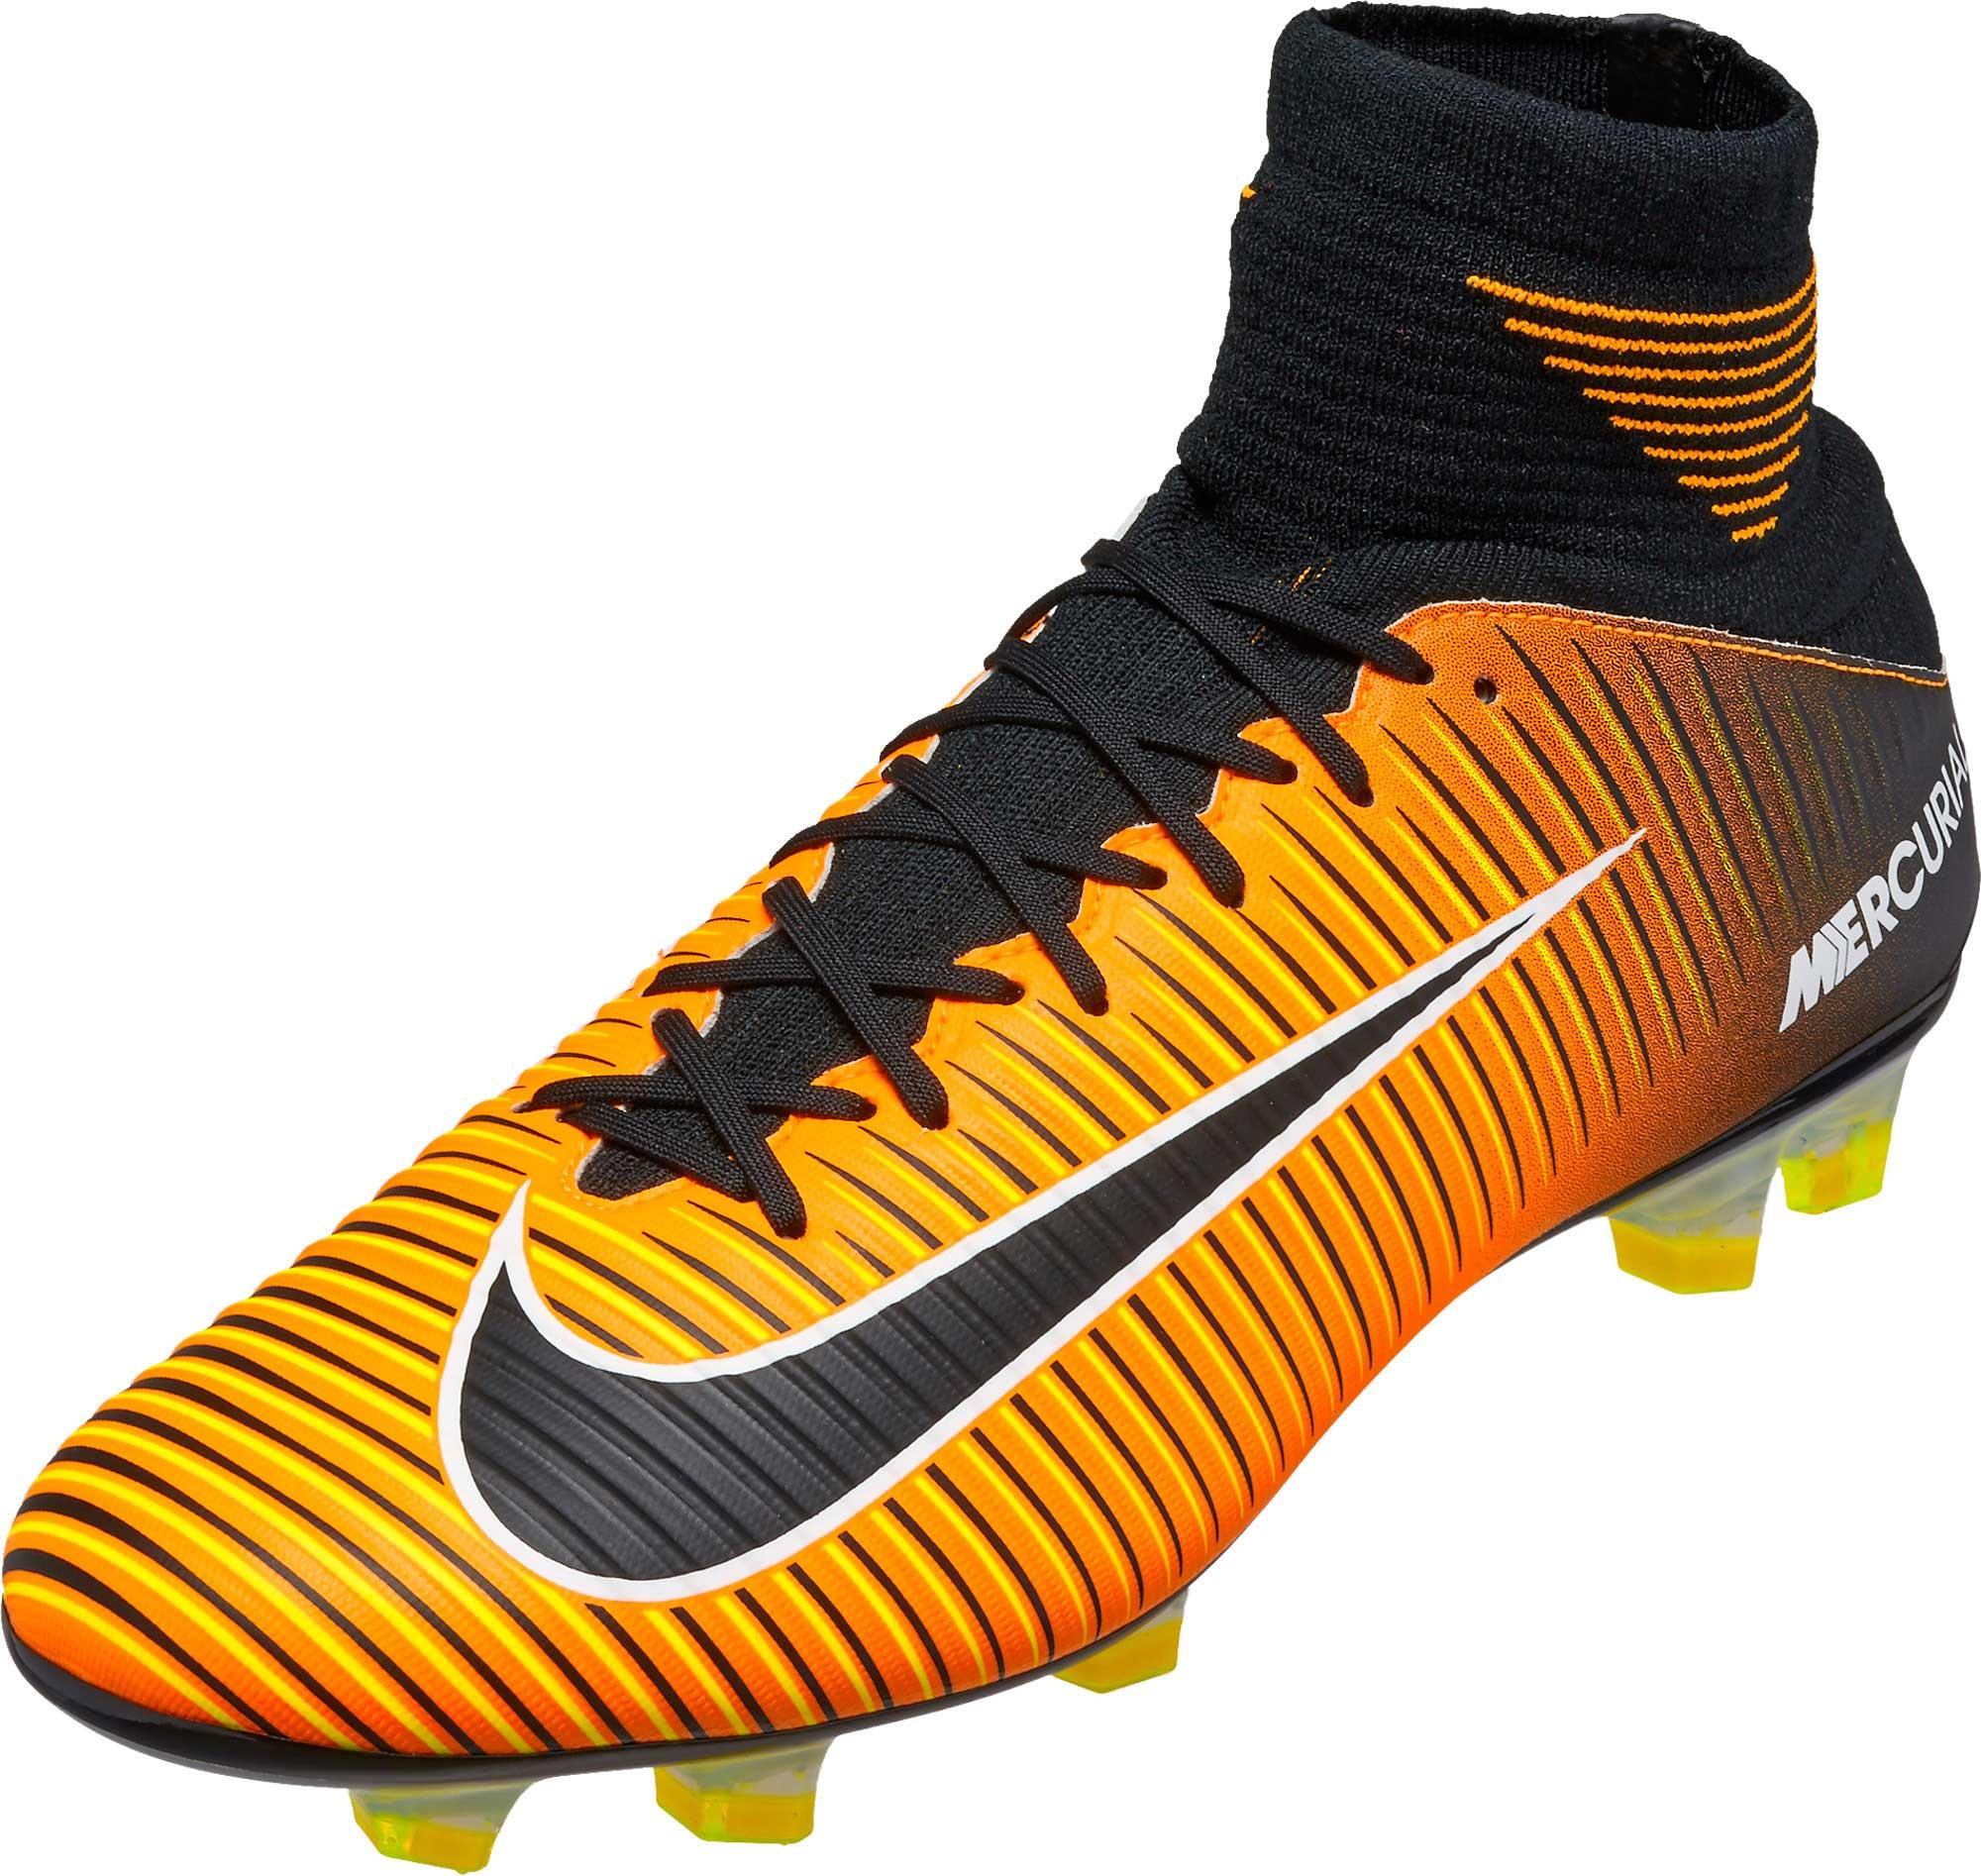 Nike Mercurial Veloce III DF FG Soccer Cleats- SoccerPro.com